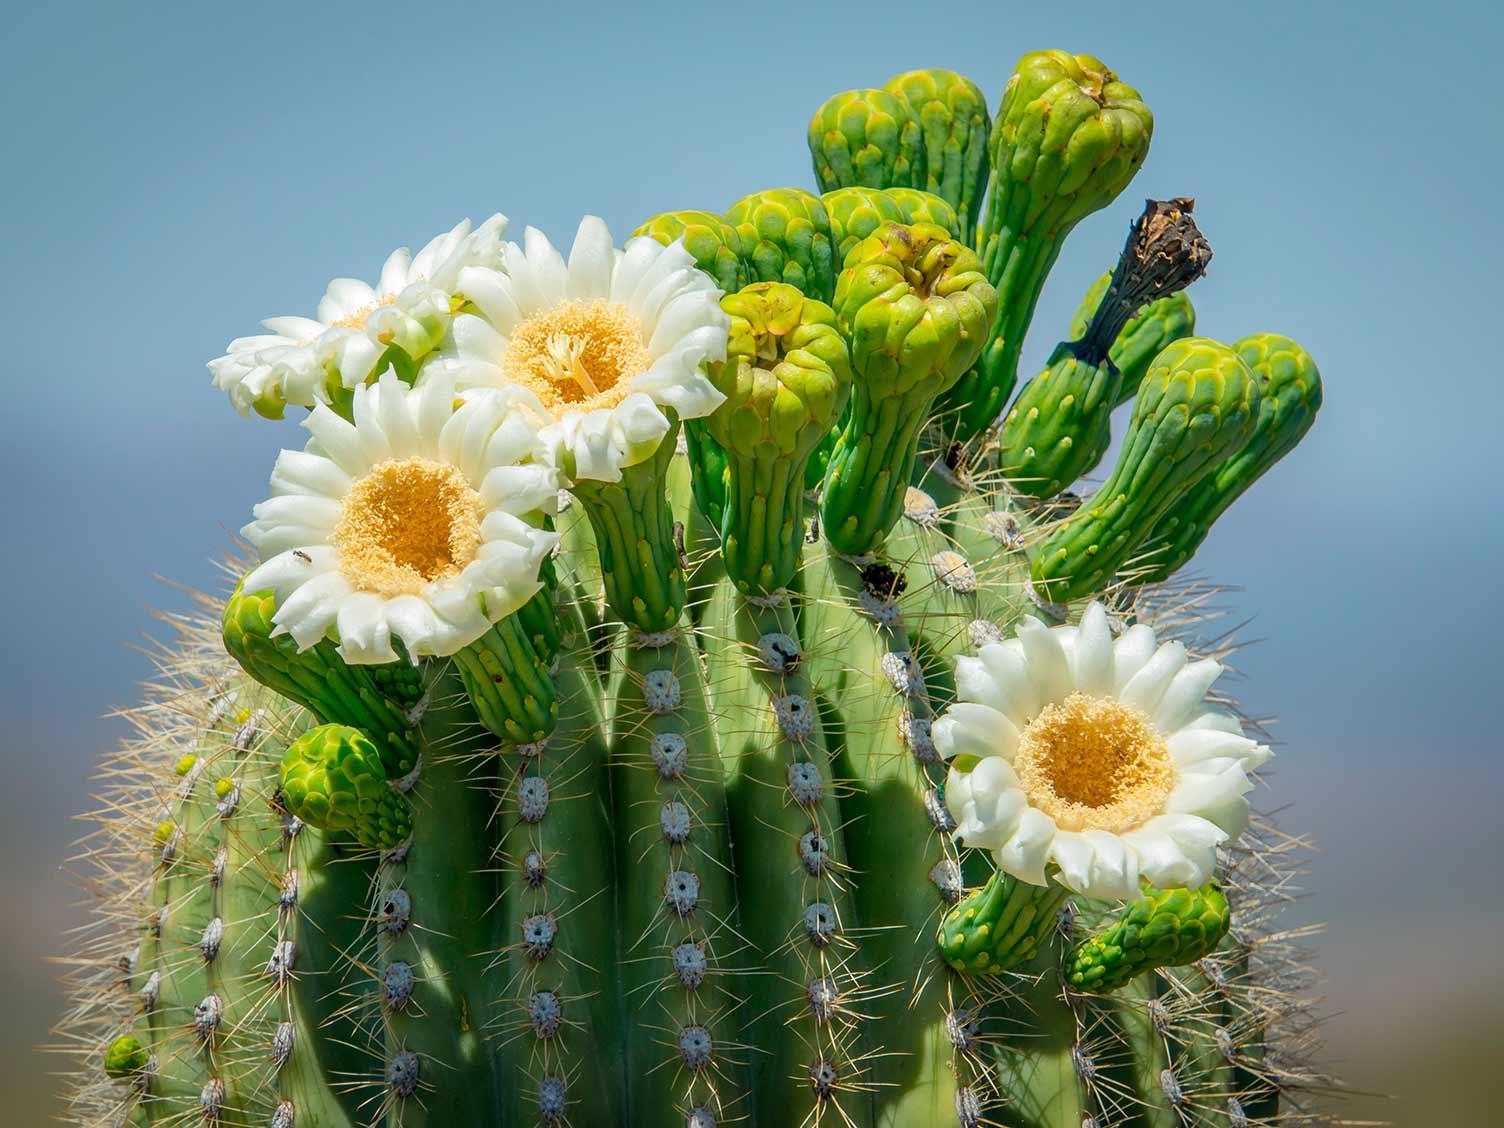 Saguaro National Park – Tjs Garden |Saguaro Cactus Flowers